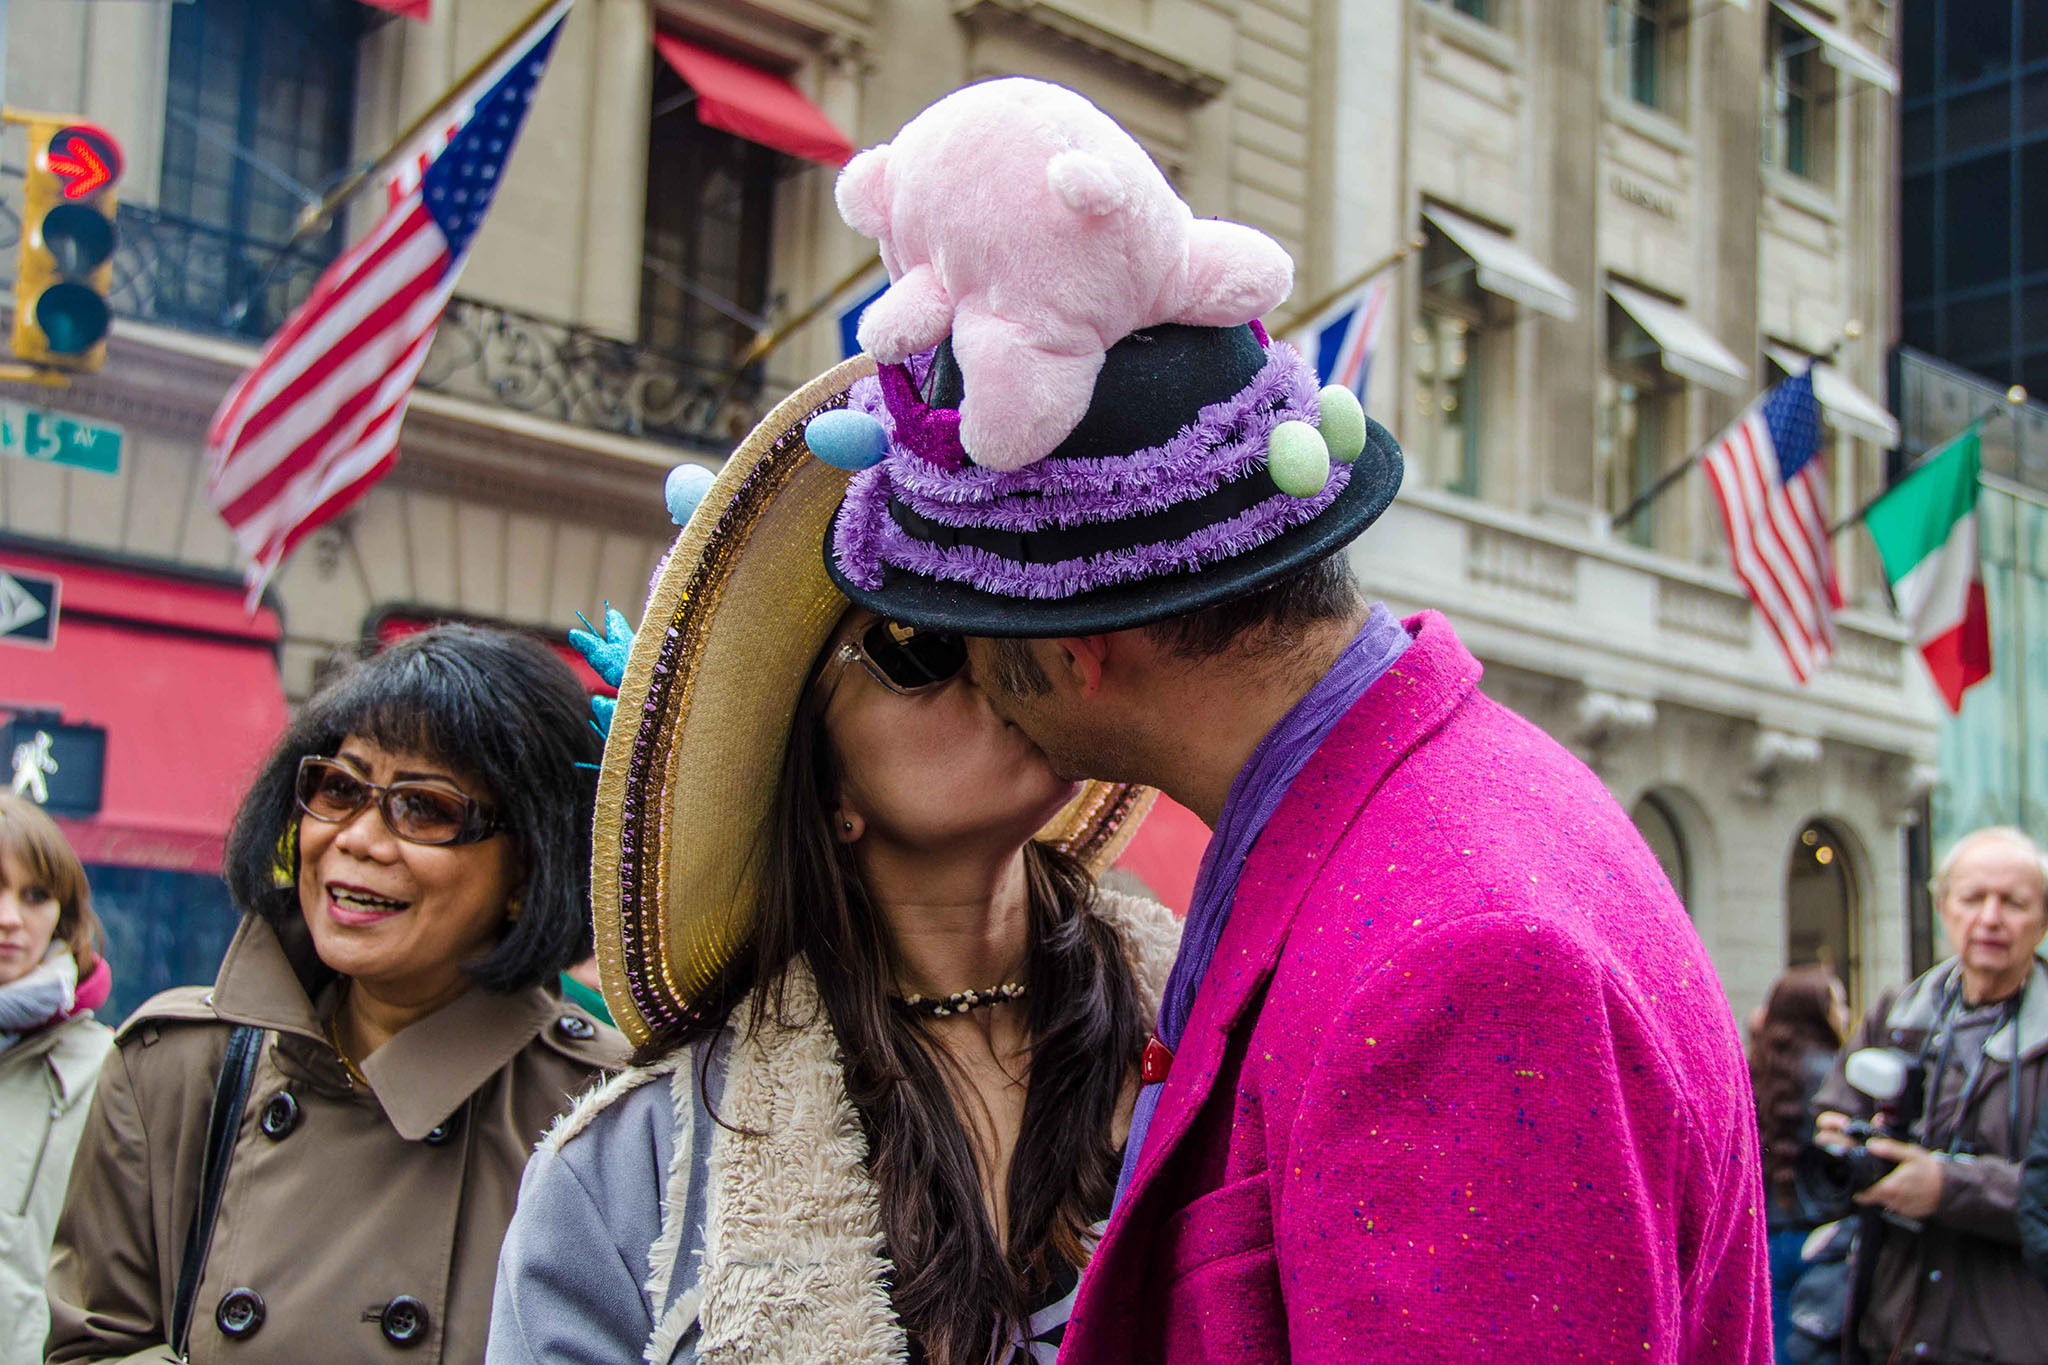 Easter Parade and Bonnet Festival 2013